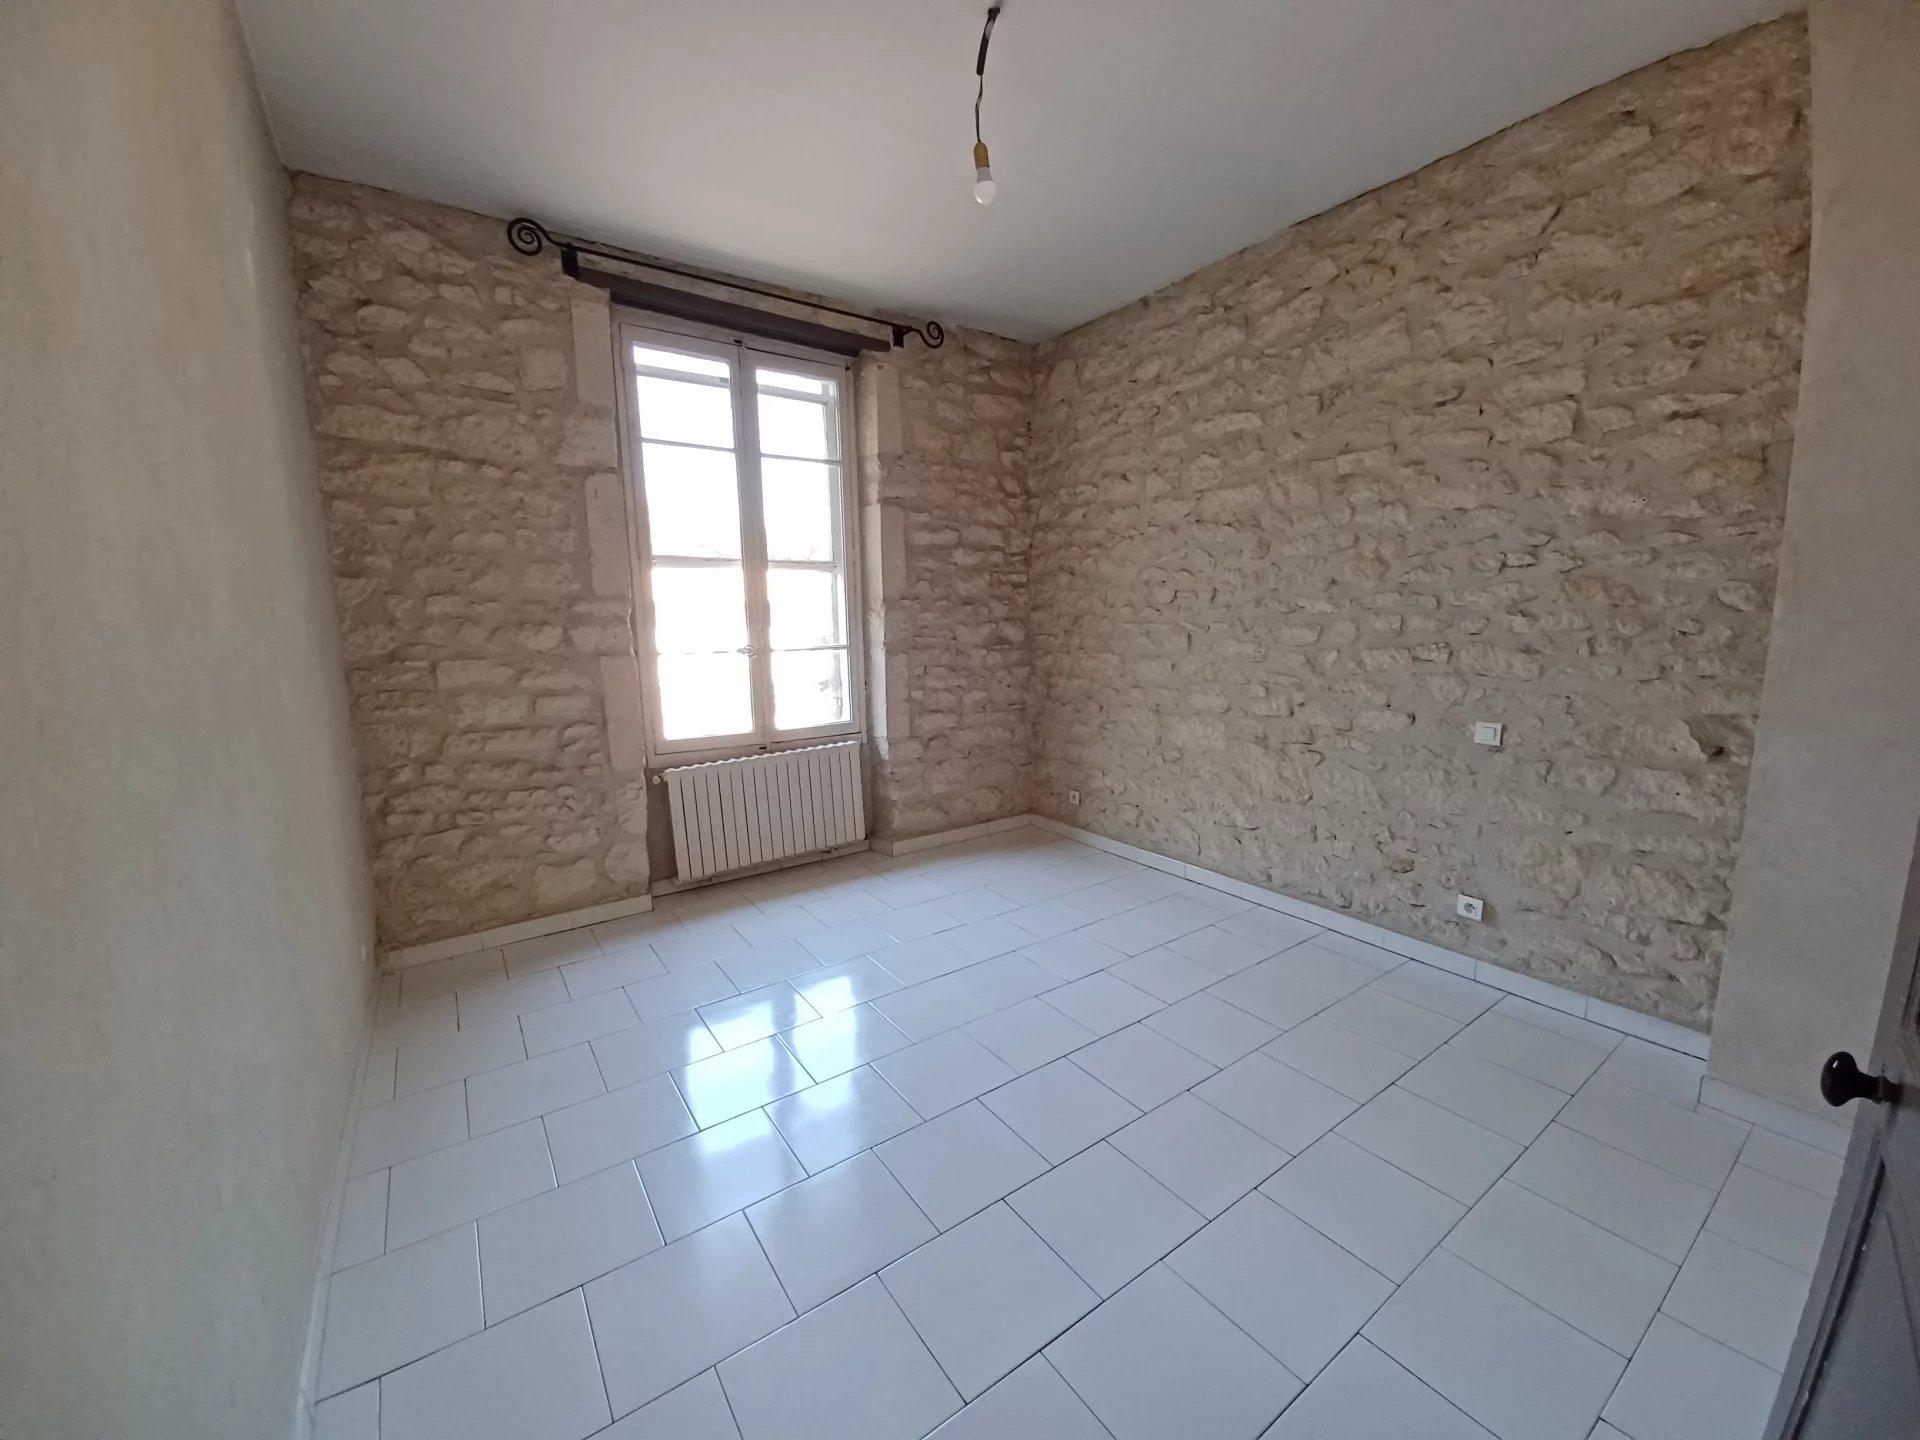 Location Appartement TARASCON surface habitable de 55 m²